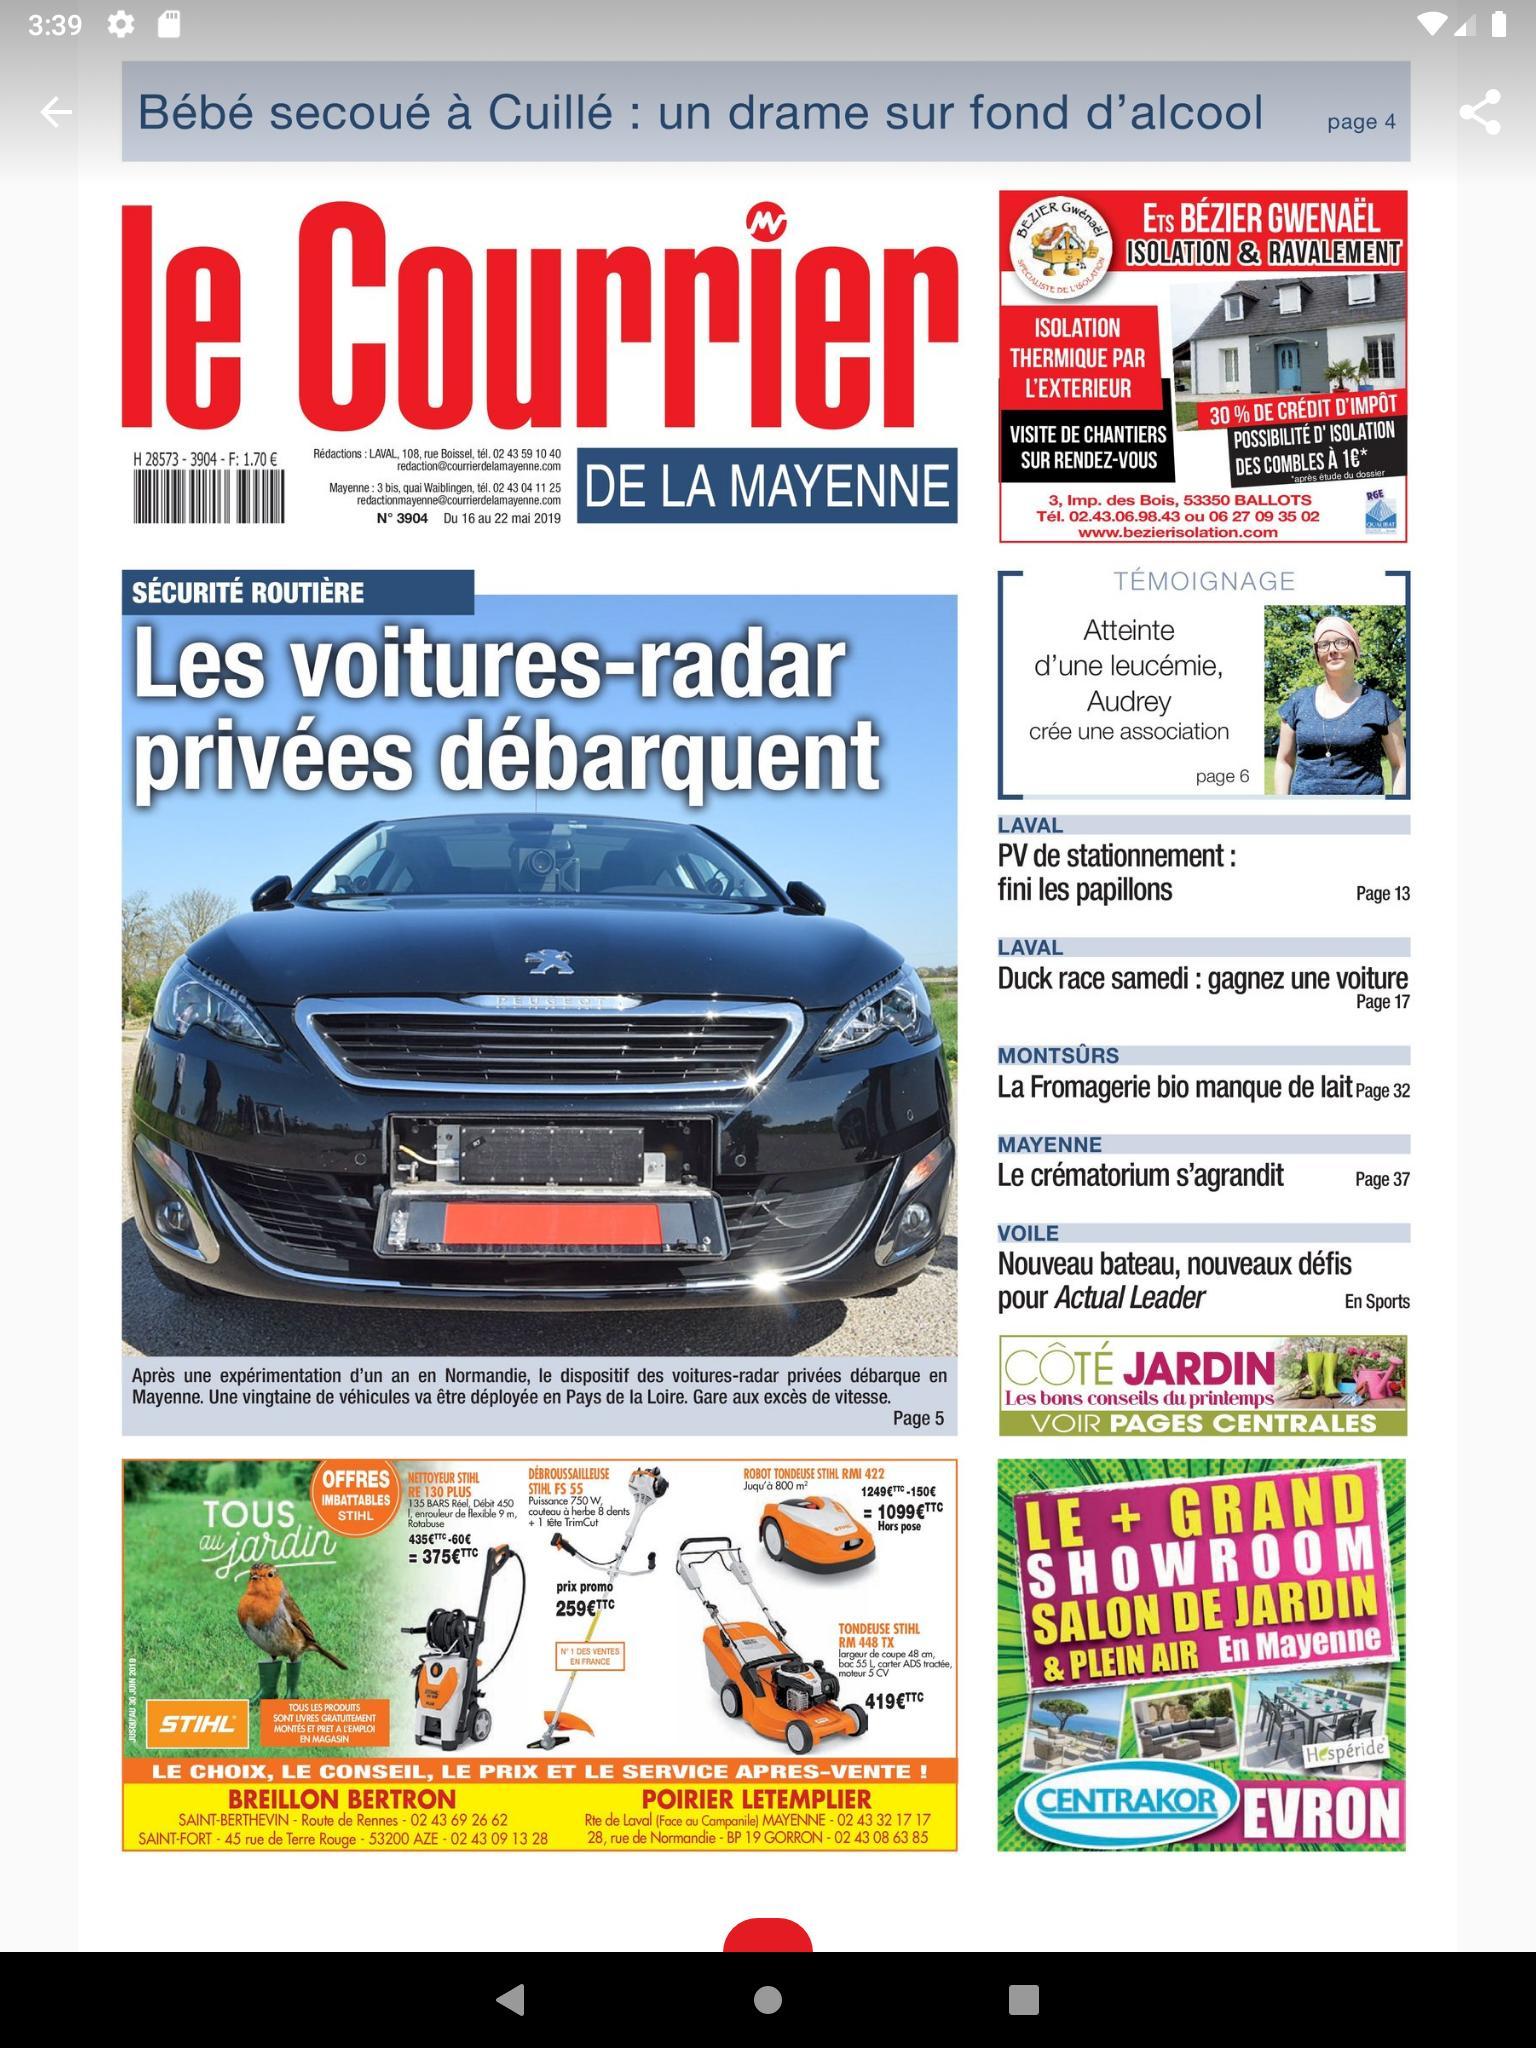 Android Için Le Courrier - Apk'yı İndir à Salon De Jardin Centrakor